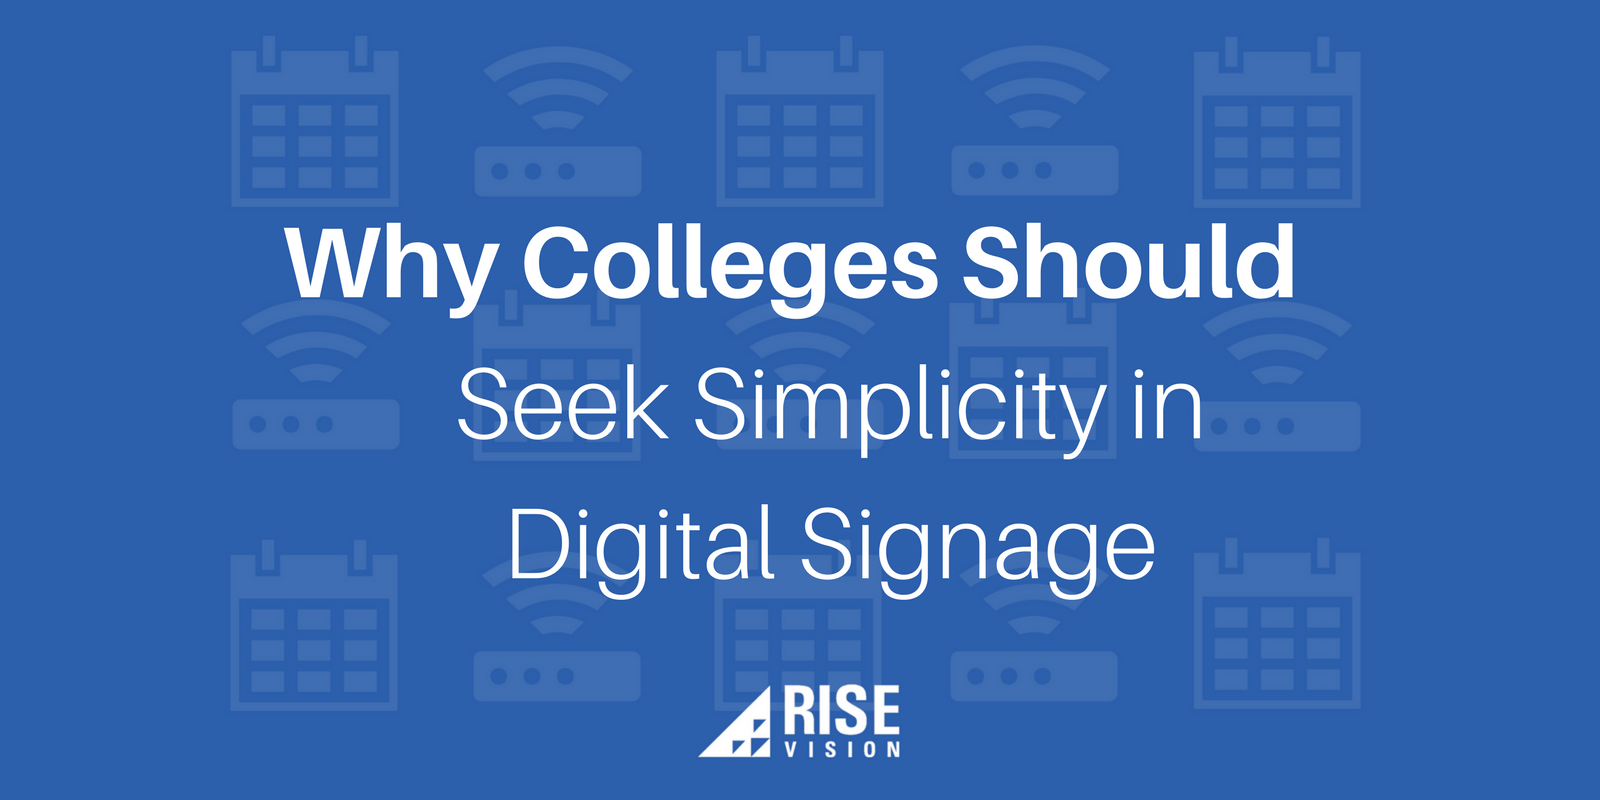 Rise Vision Digital Signage Education Simplicity.png